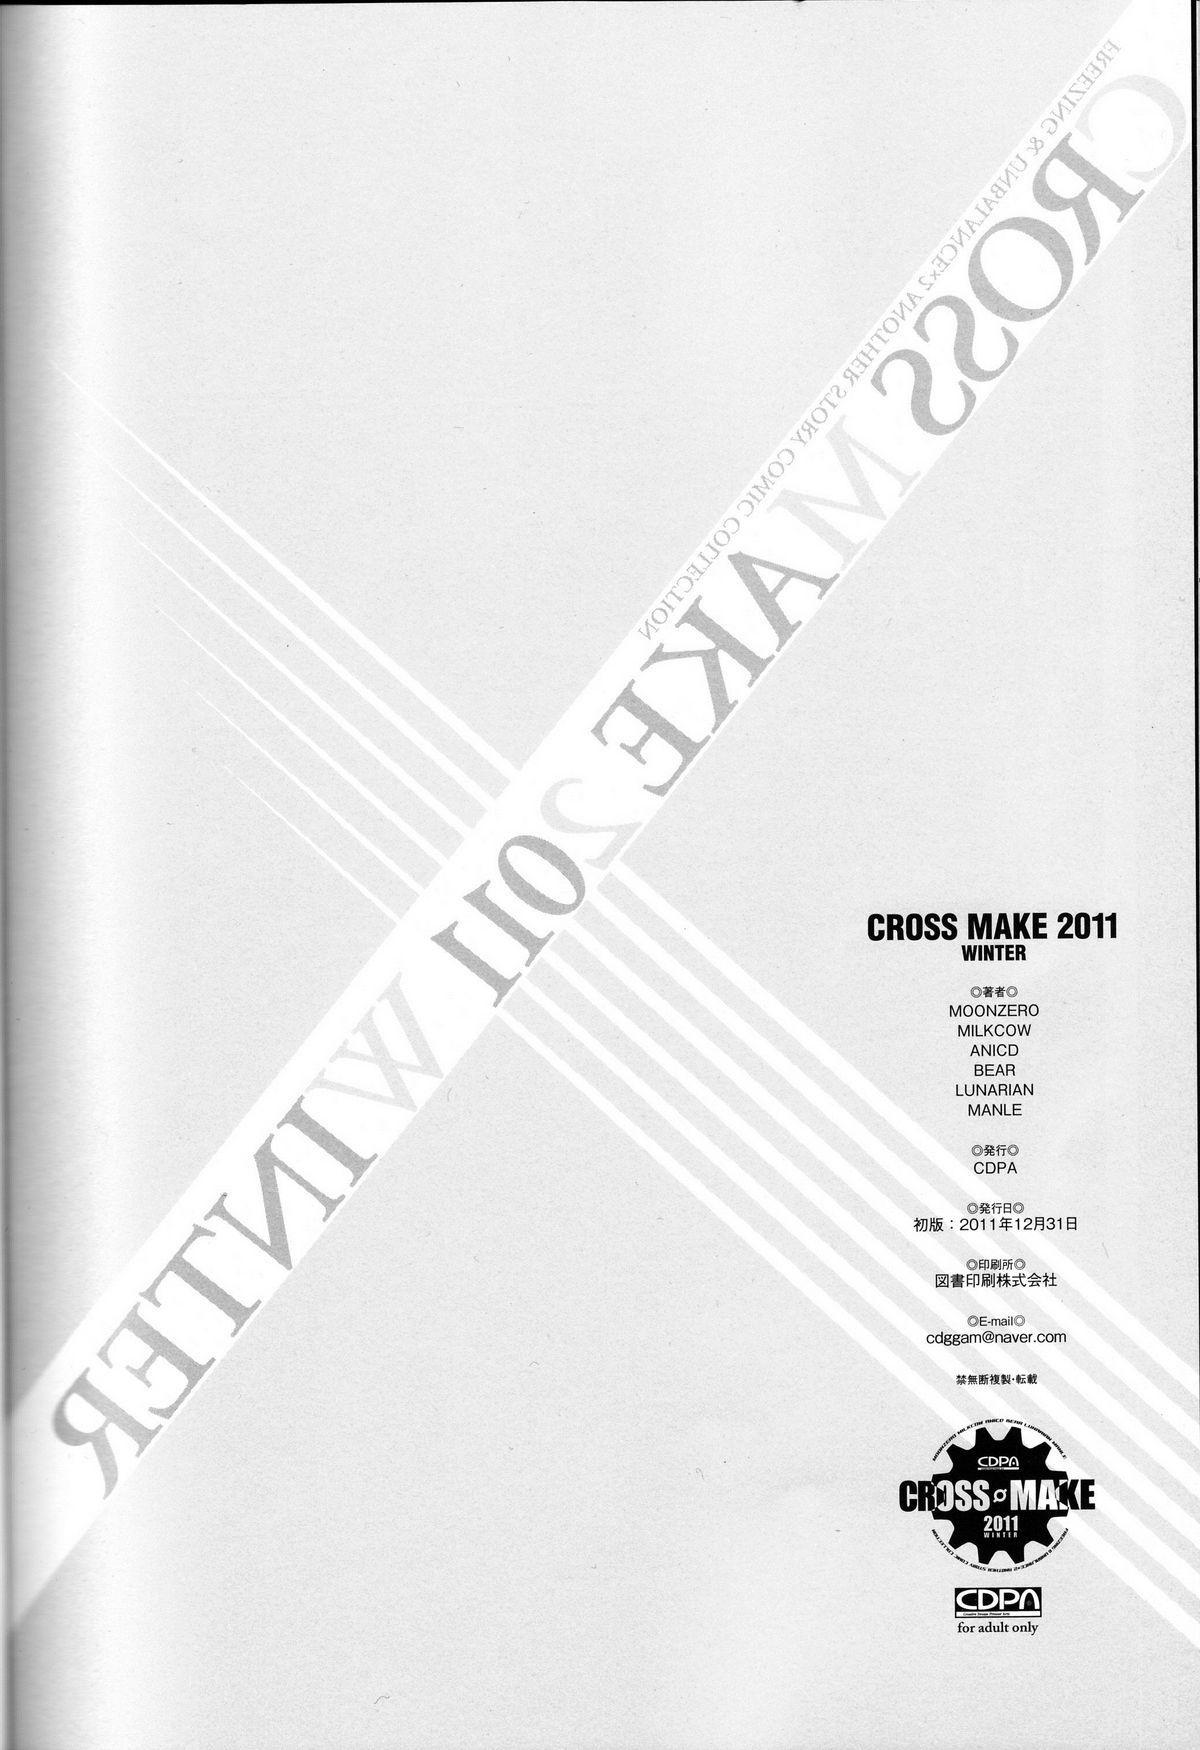 CROSS MAKE 2011 WINTER 113